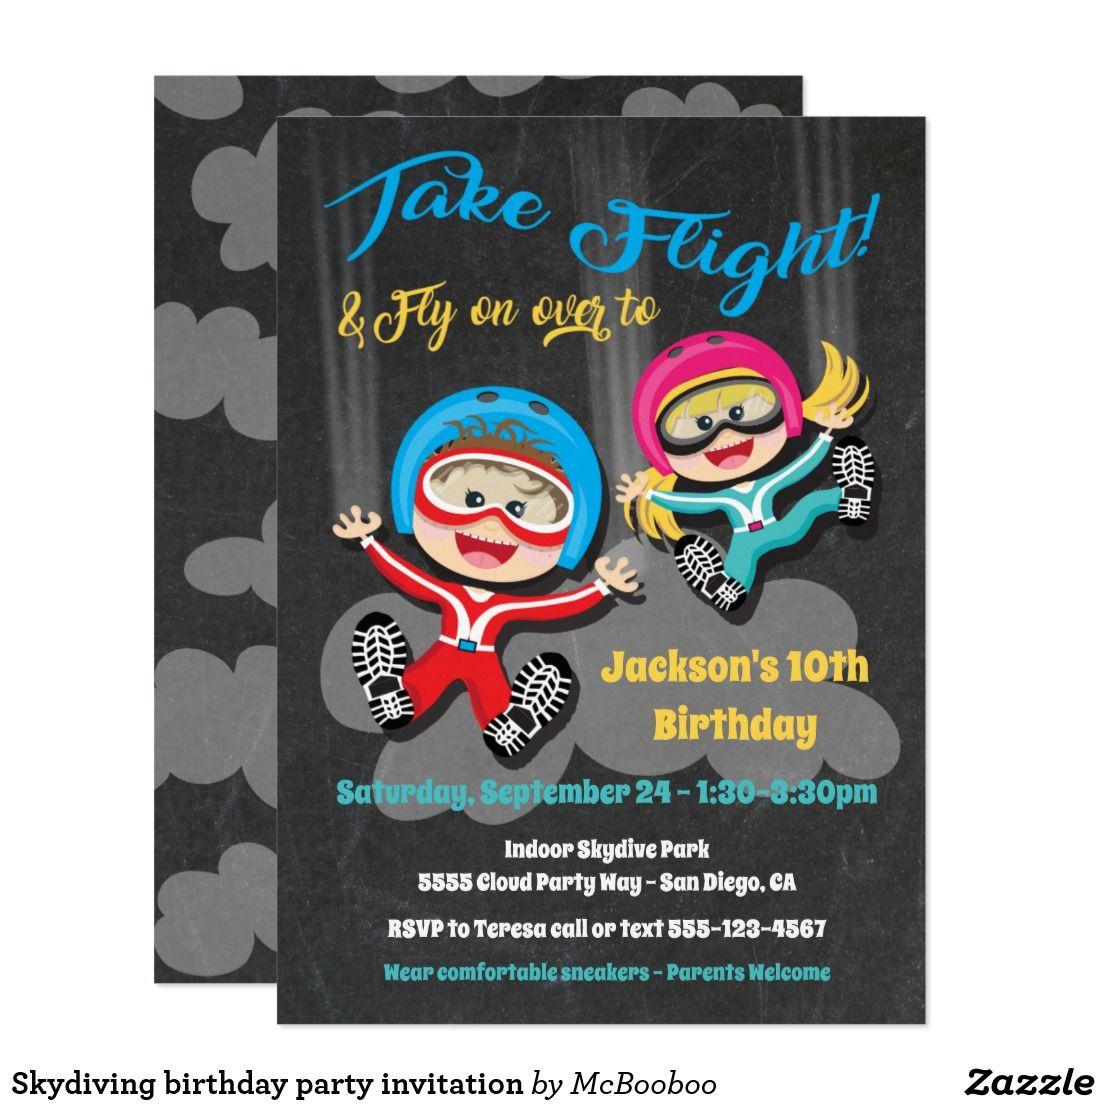 Skydiving birthday party invitation